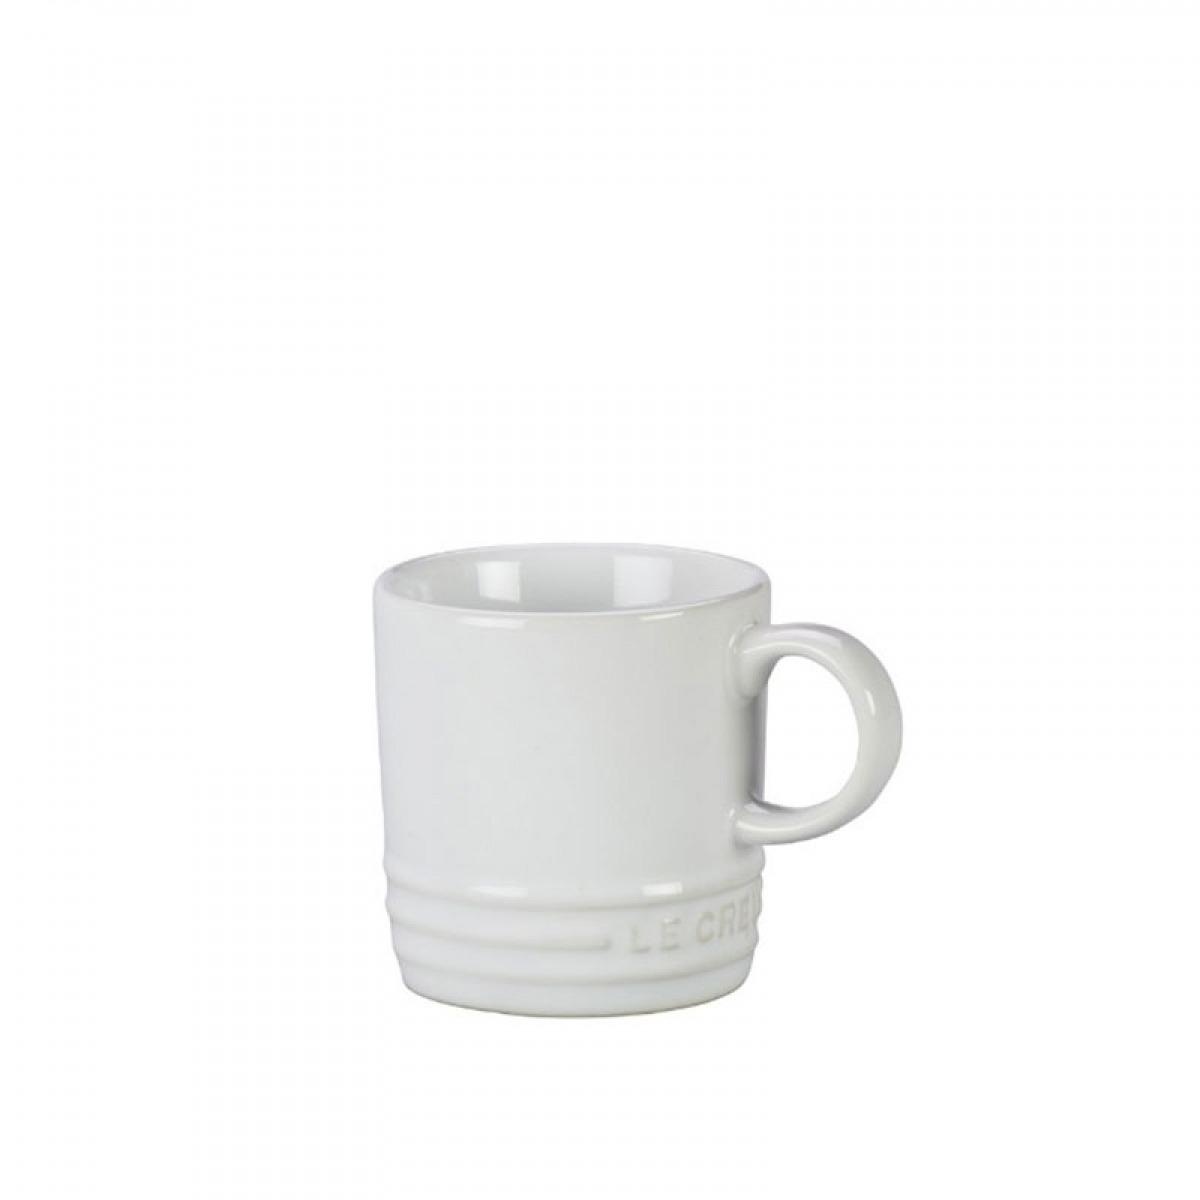 Caneca Espresso Le Creuset Branco